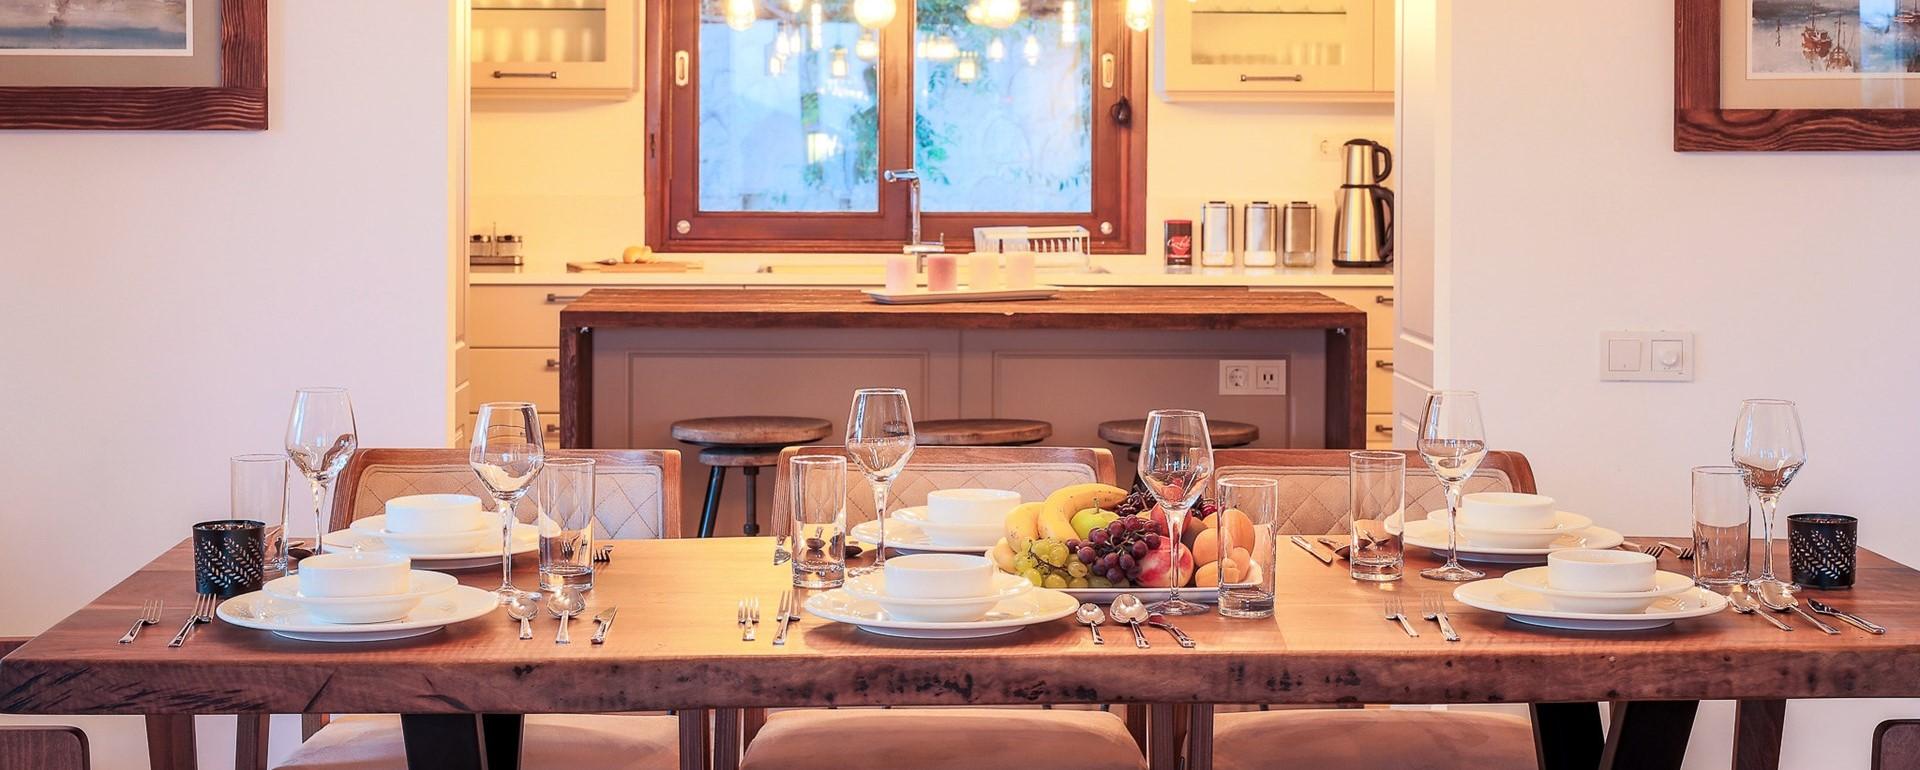 villa-caria-kalkan-kitchen-dining